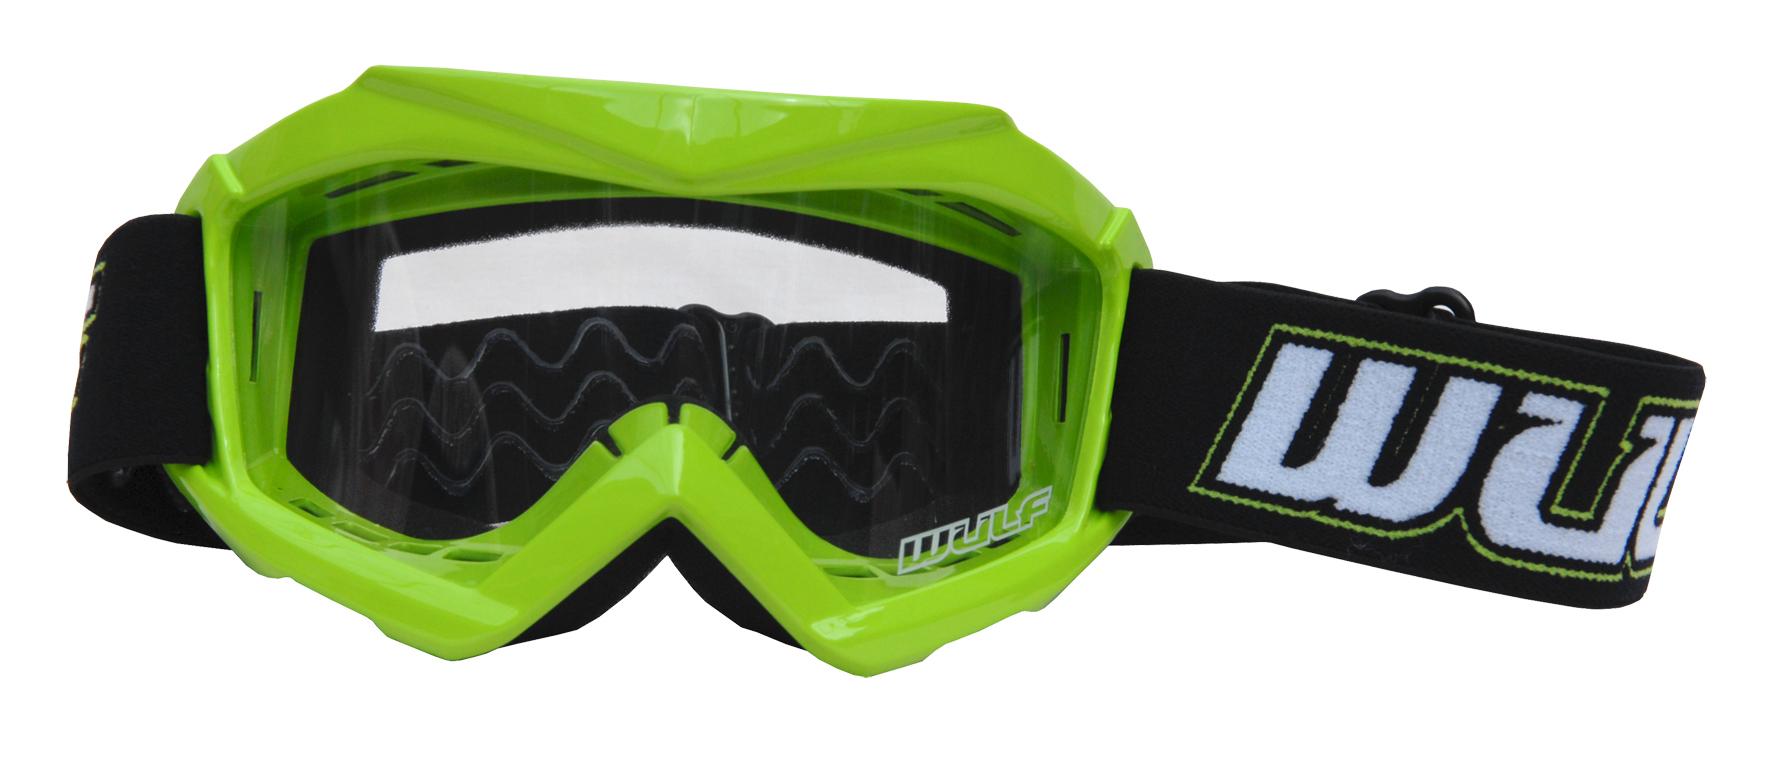 Wulfsport Cub Tech Goggles for MX Enduro - Green